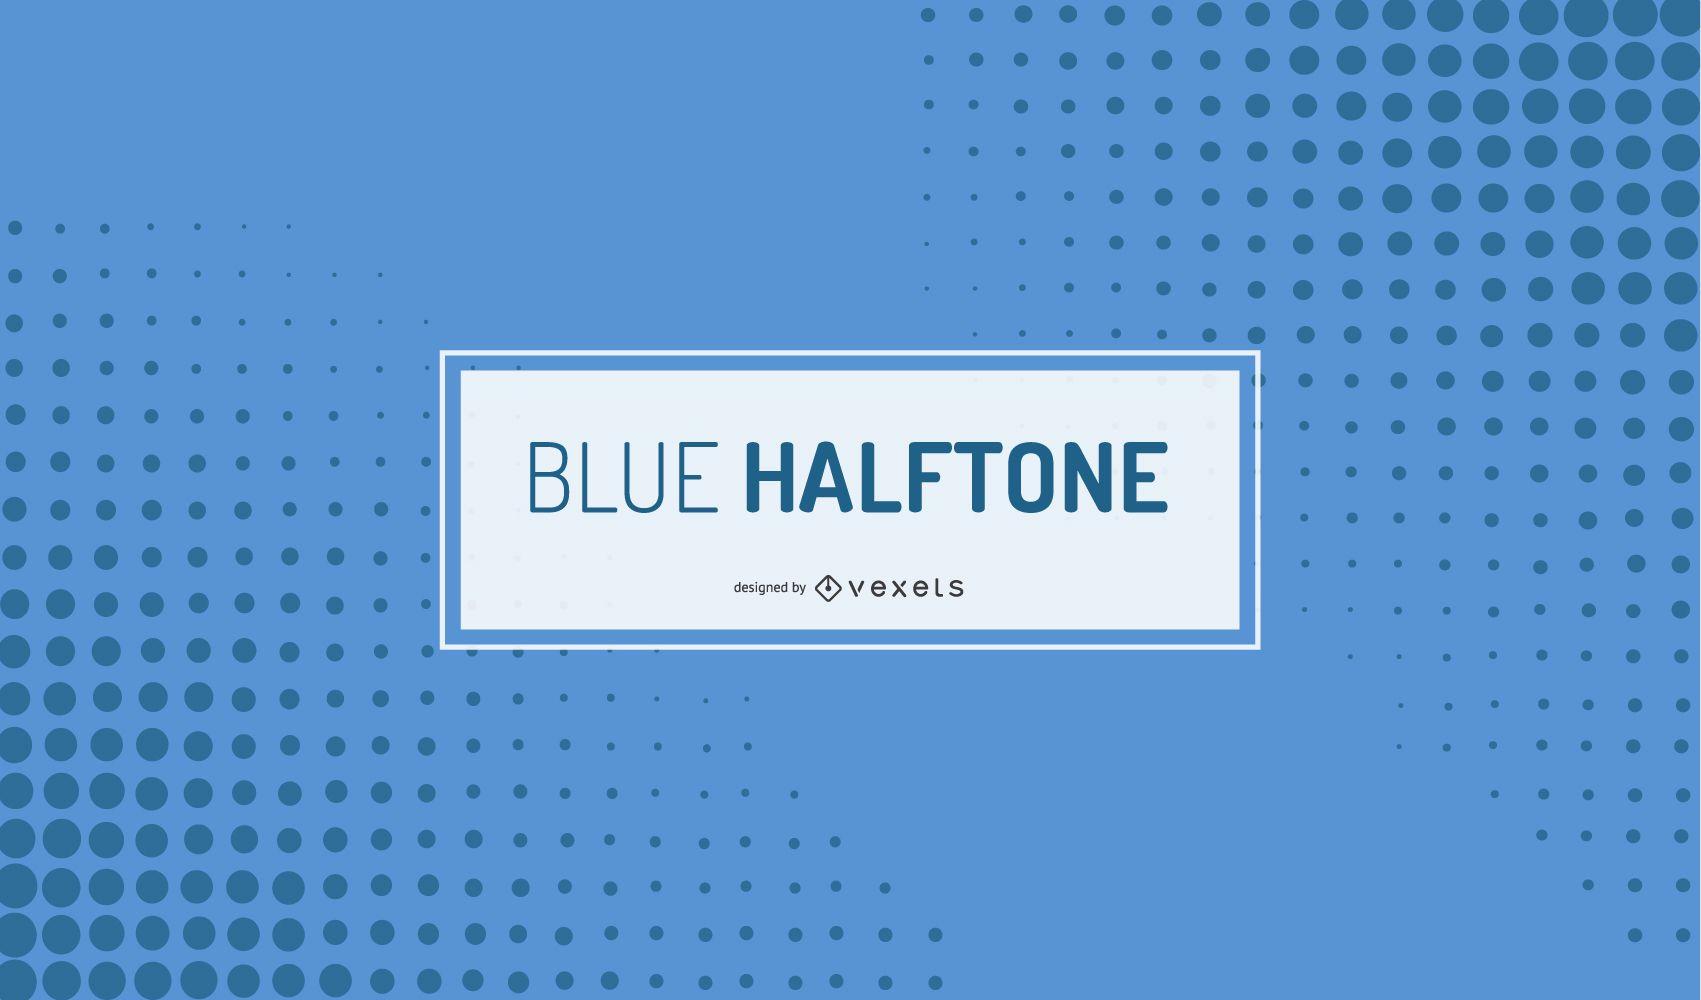 Semitono azul